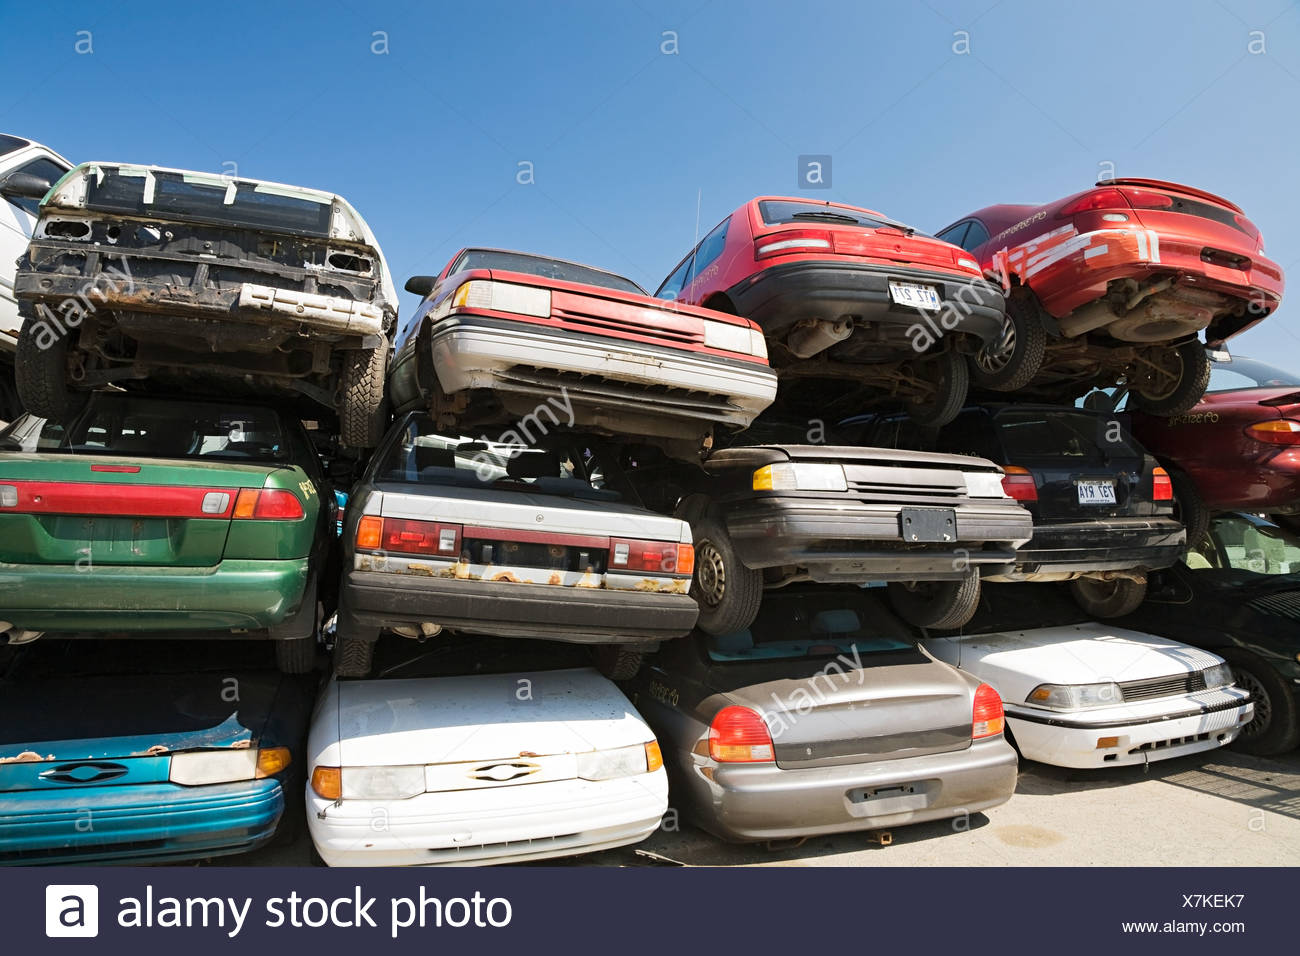 Cars at scrap yard - Stock Image